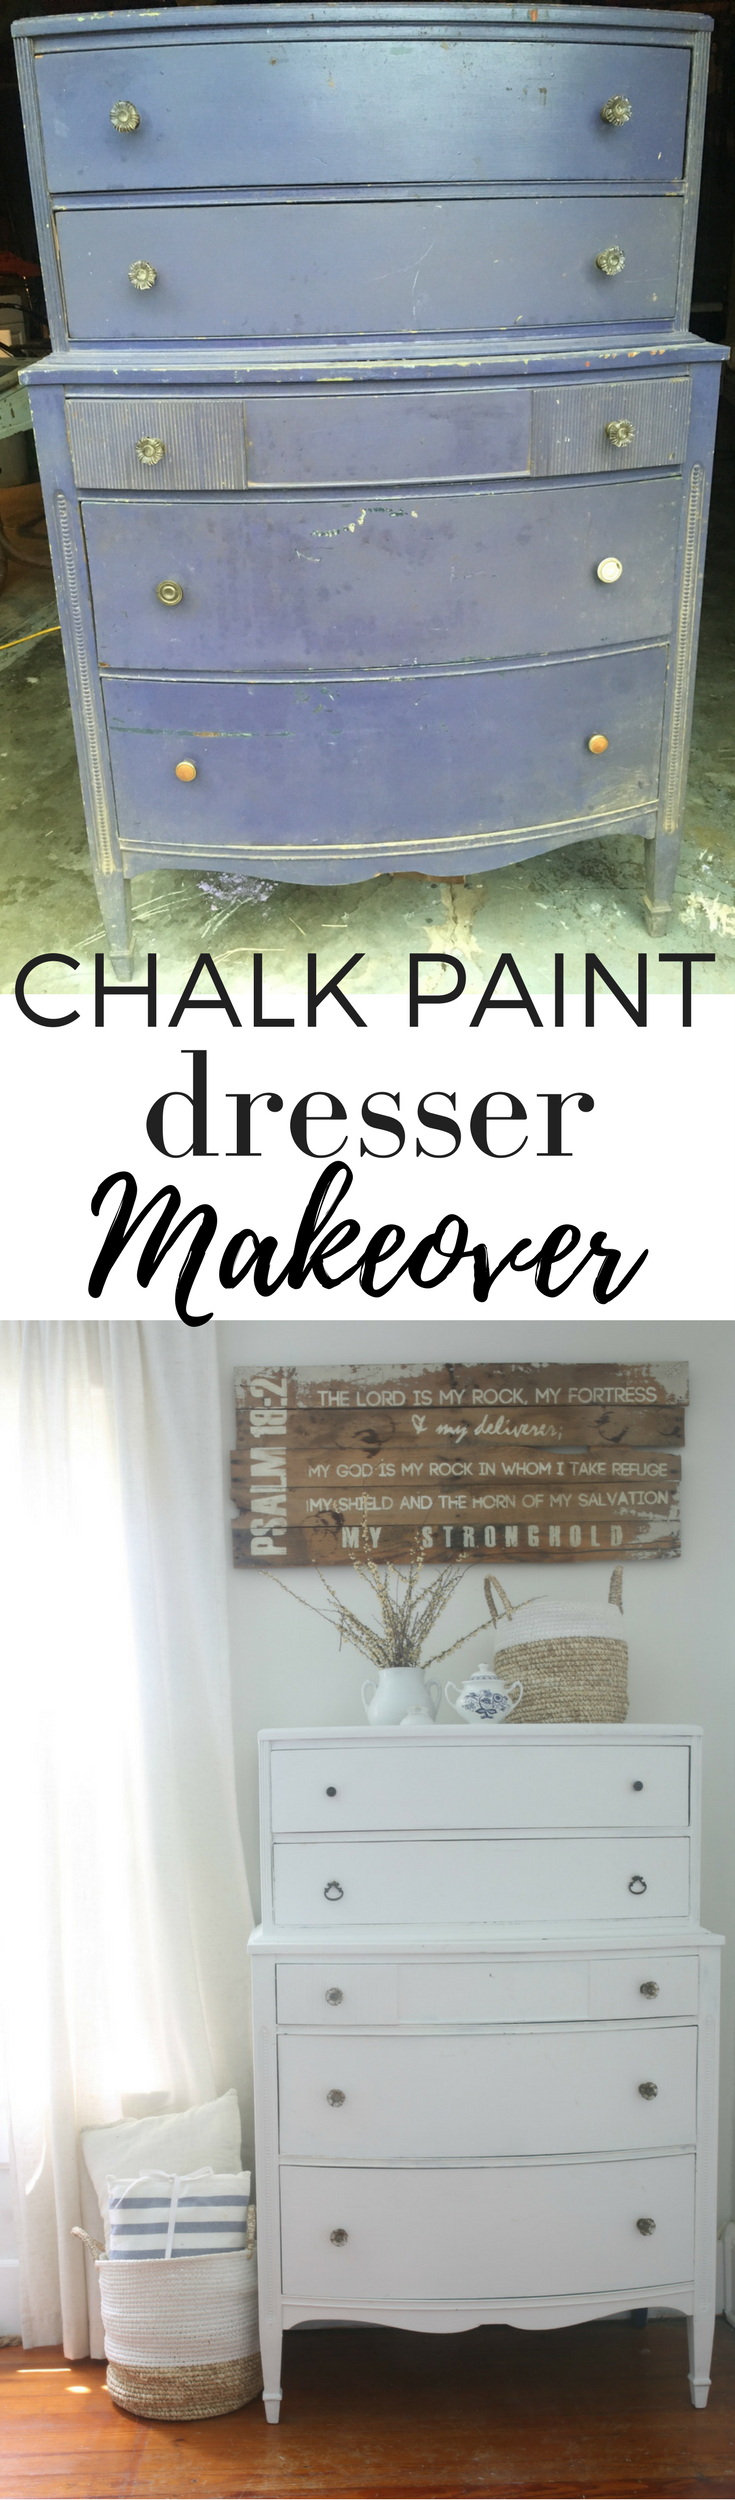 Linen White Chalk Paint Dresser Makeover Farmhouse Style